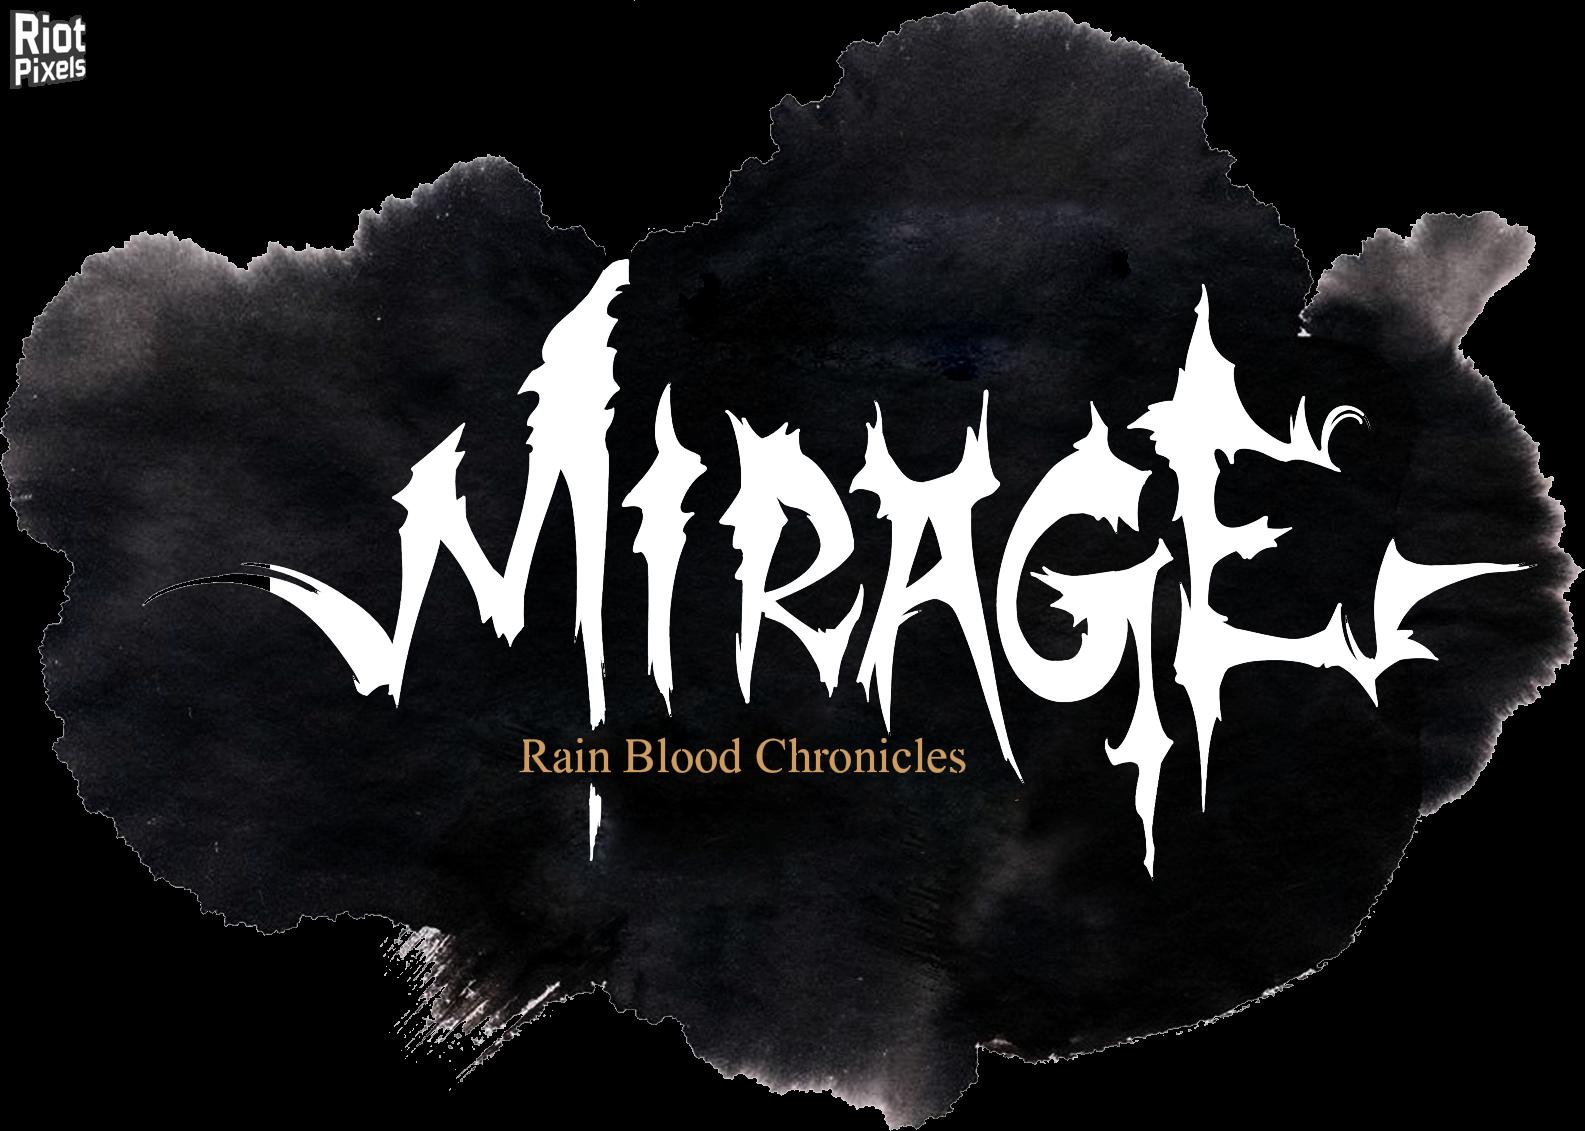 Rain Blood Chronicles Mirage  Это лучшее во что я играл в последнее время.2-D Слешер, в аниме стиле, с хот-сит'ым ко .... - Изображение 1